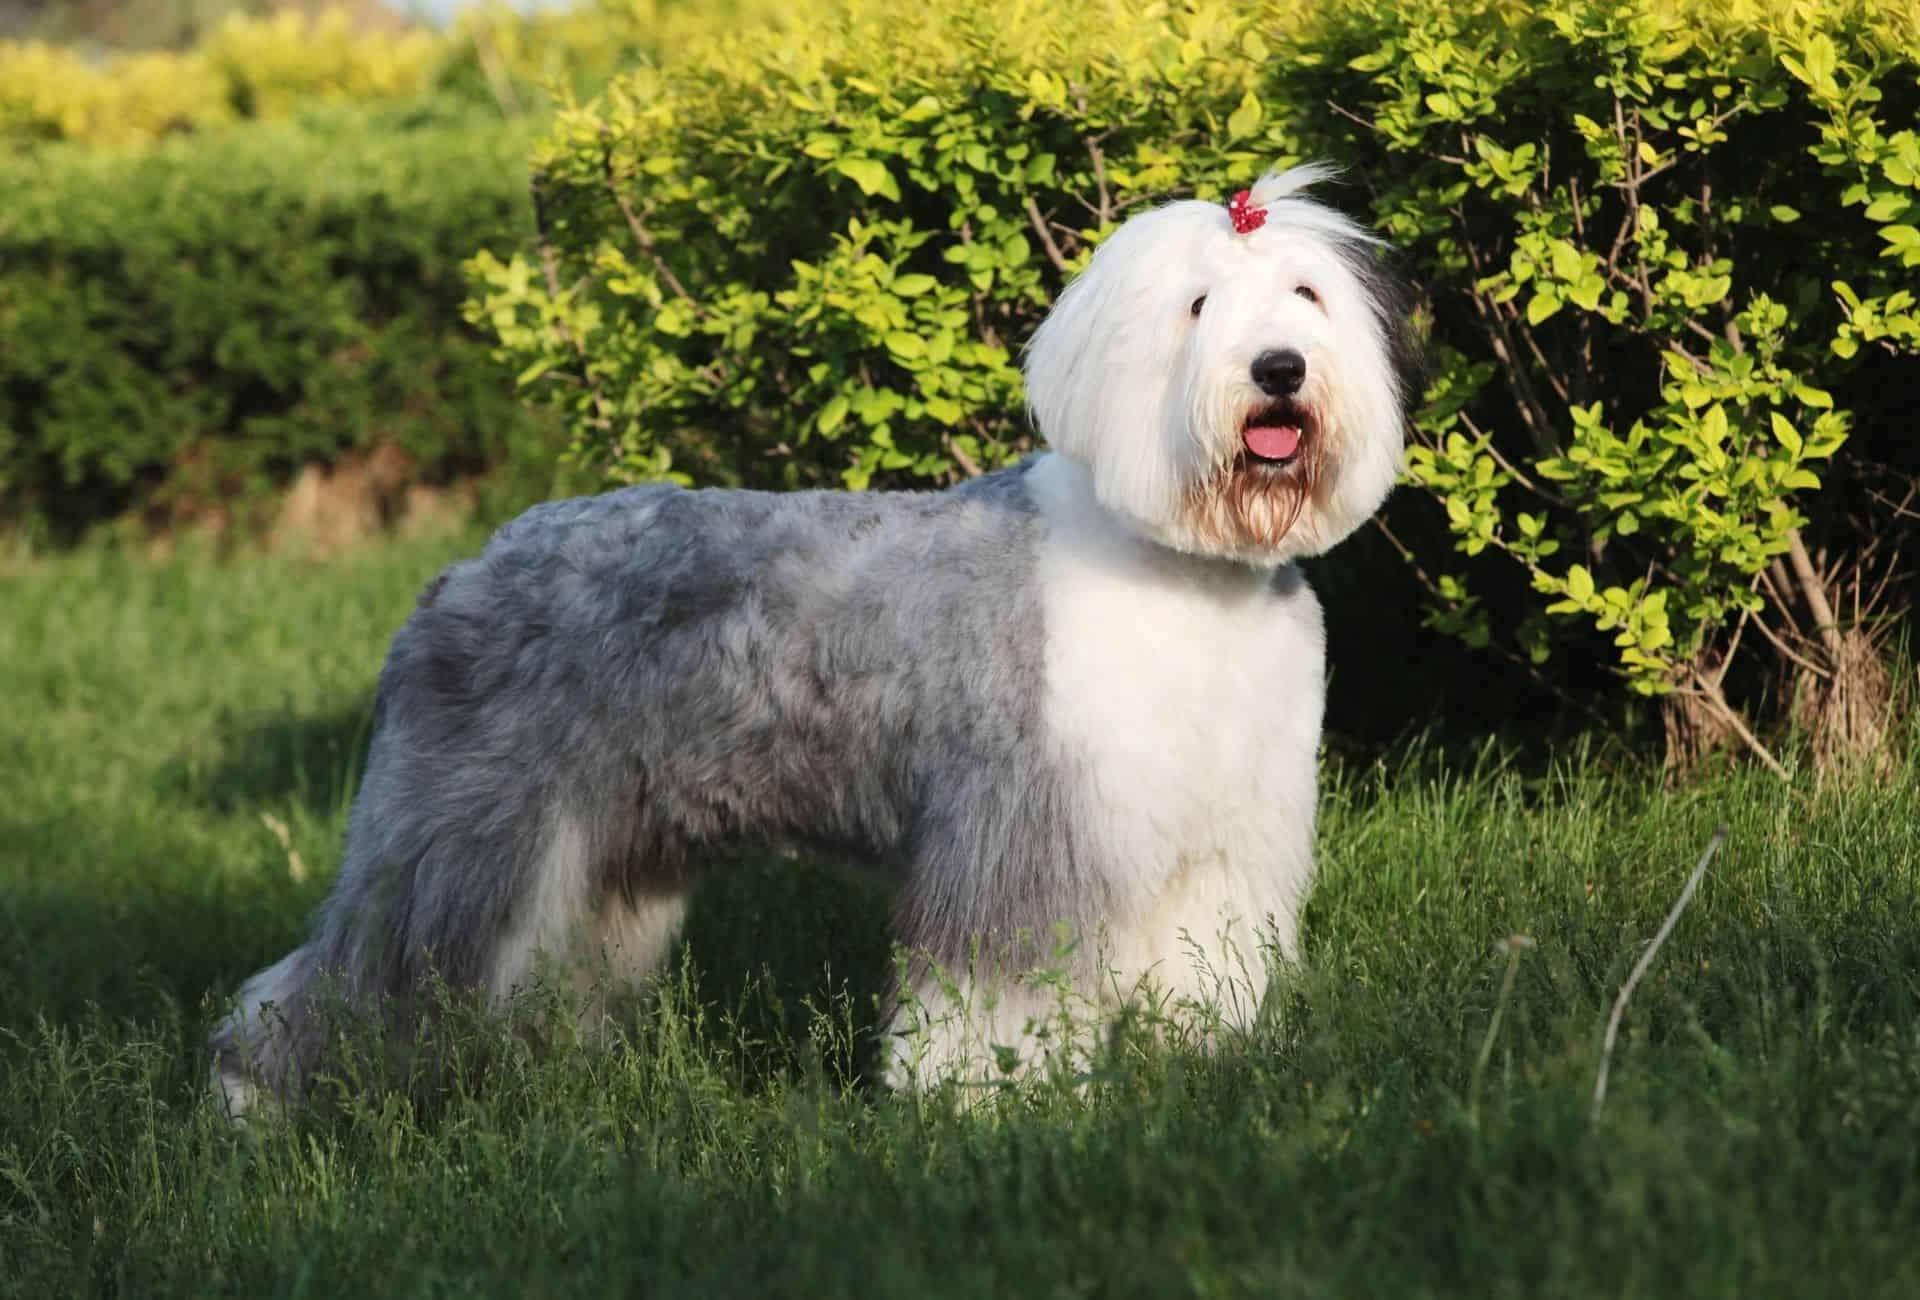 Old English Sheepdog with a cute haircut.